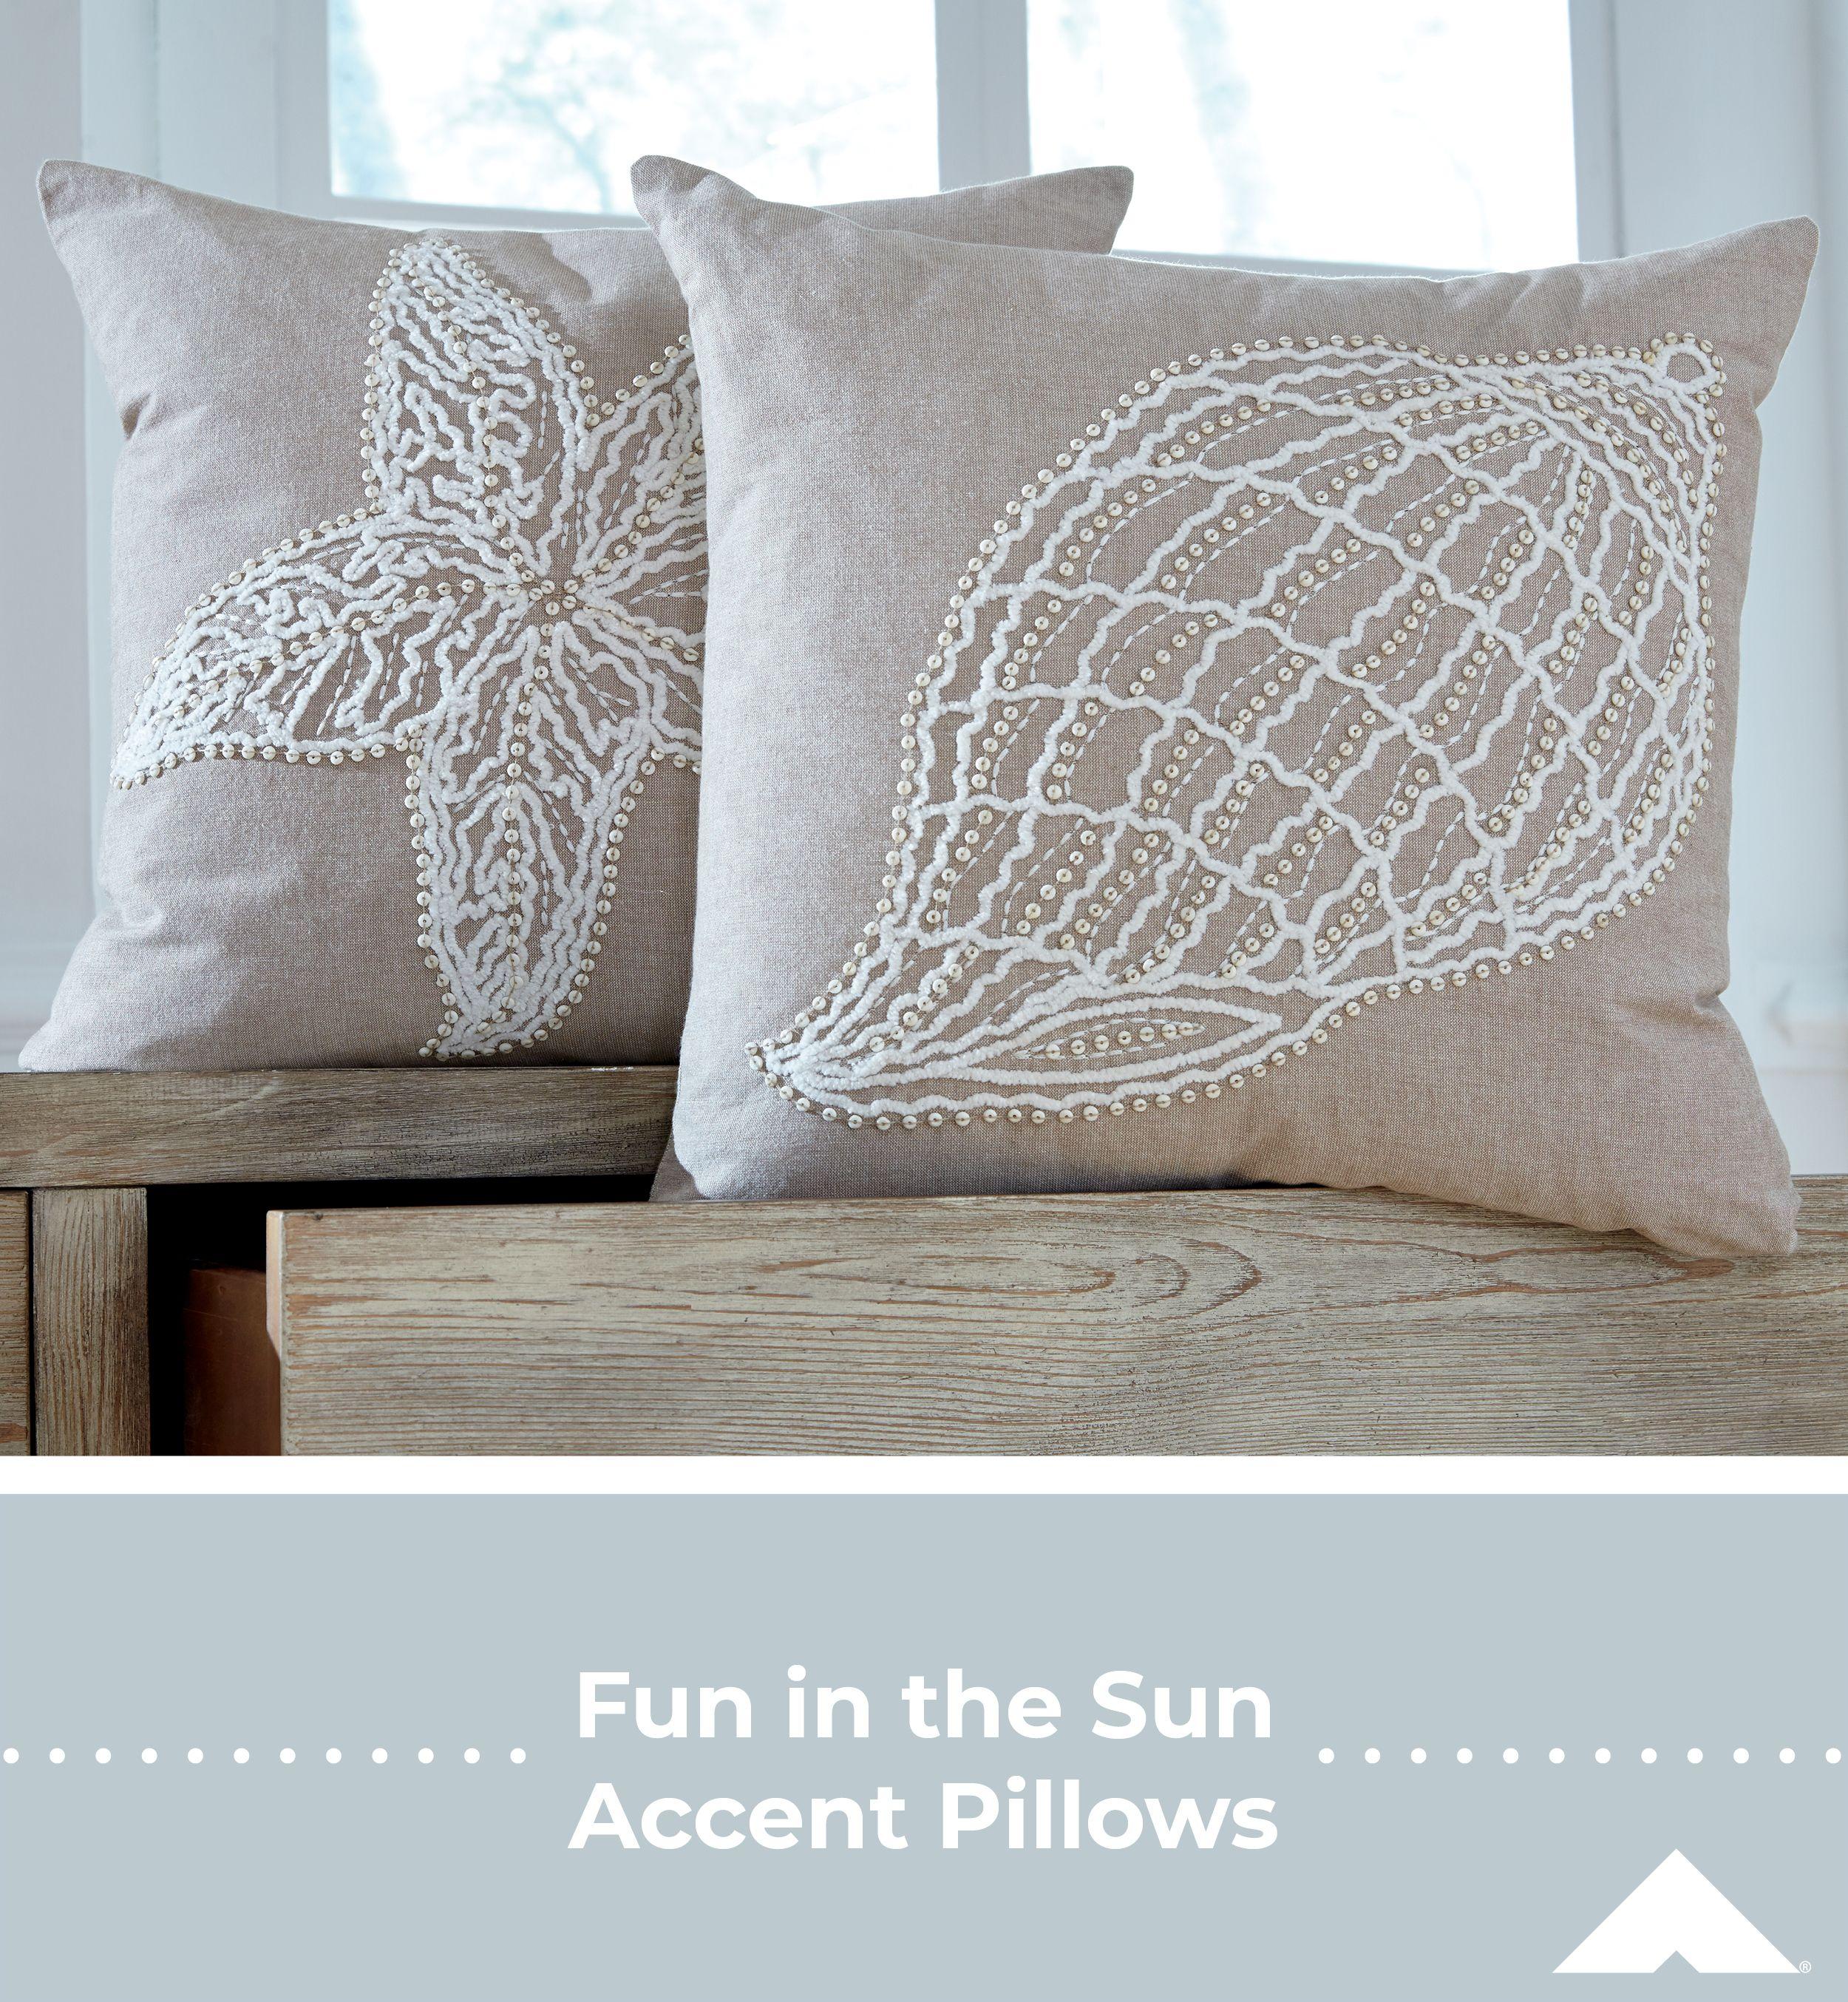 Anshel Natural Accent Pillows By Ashley Furniture - #Ashleyfurniture #Homedecor